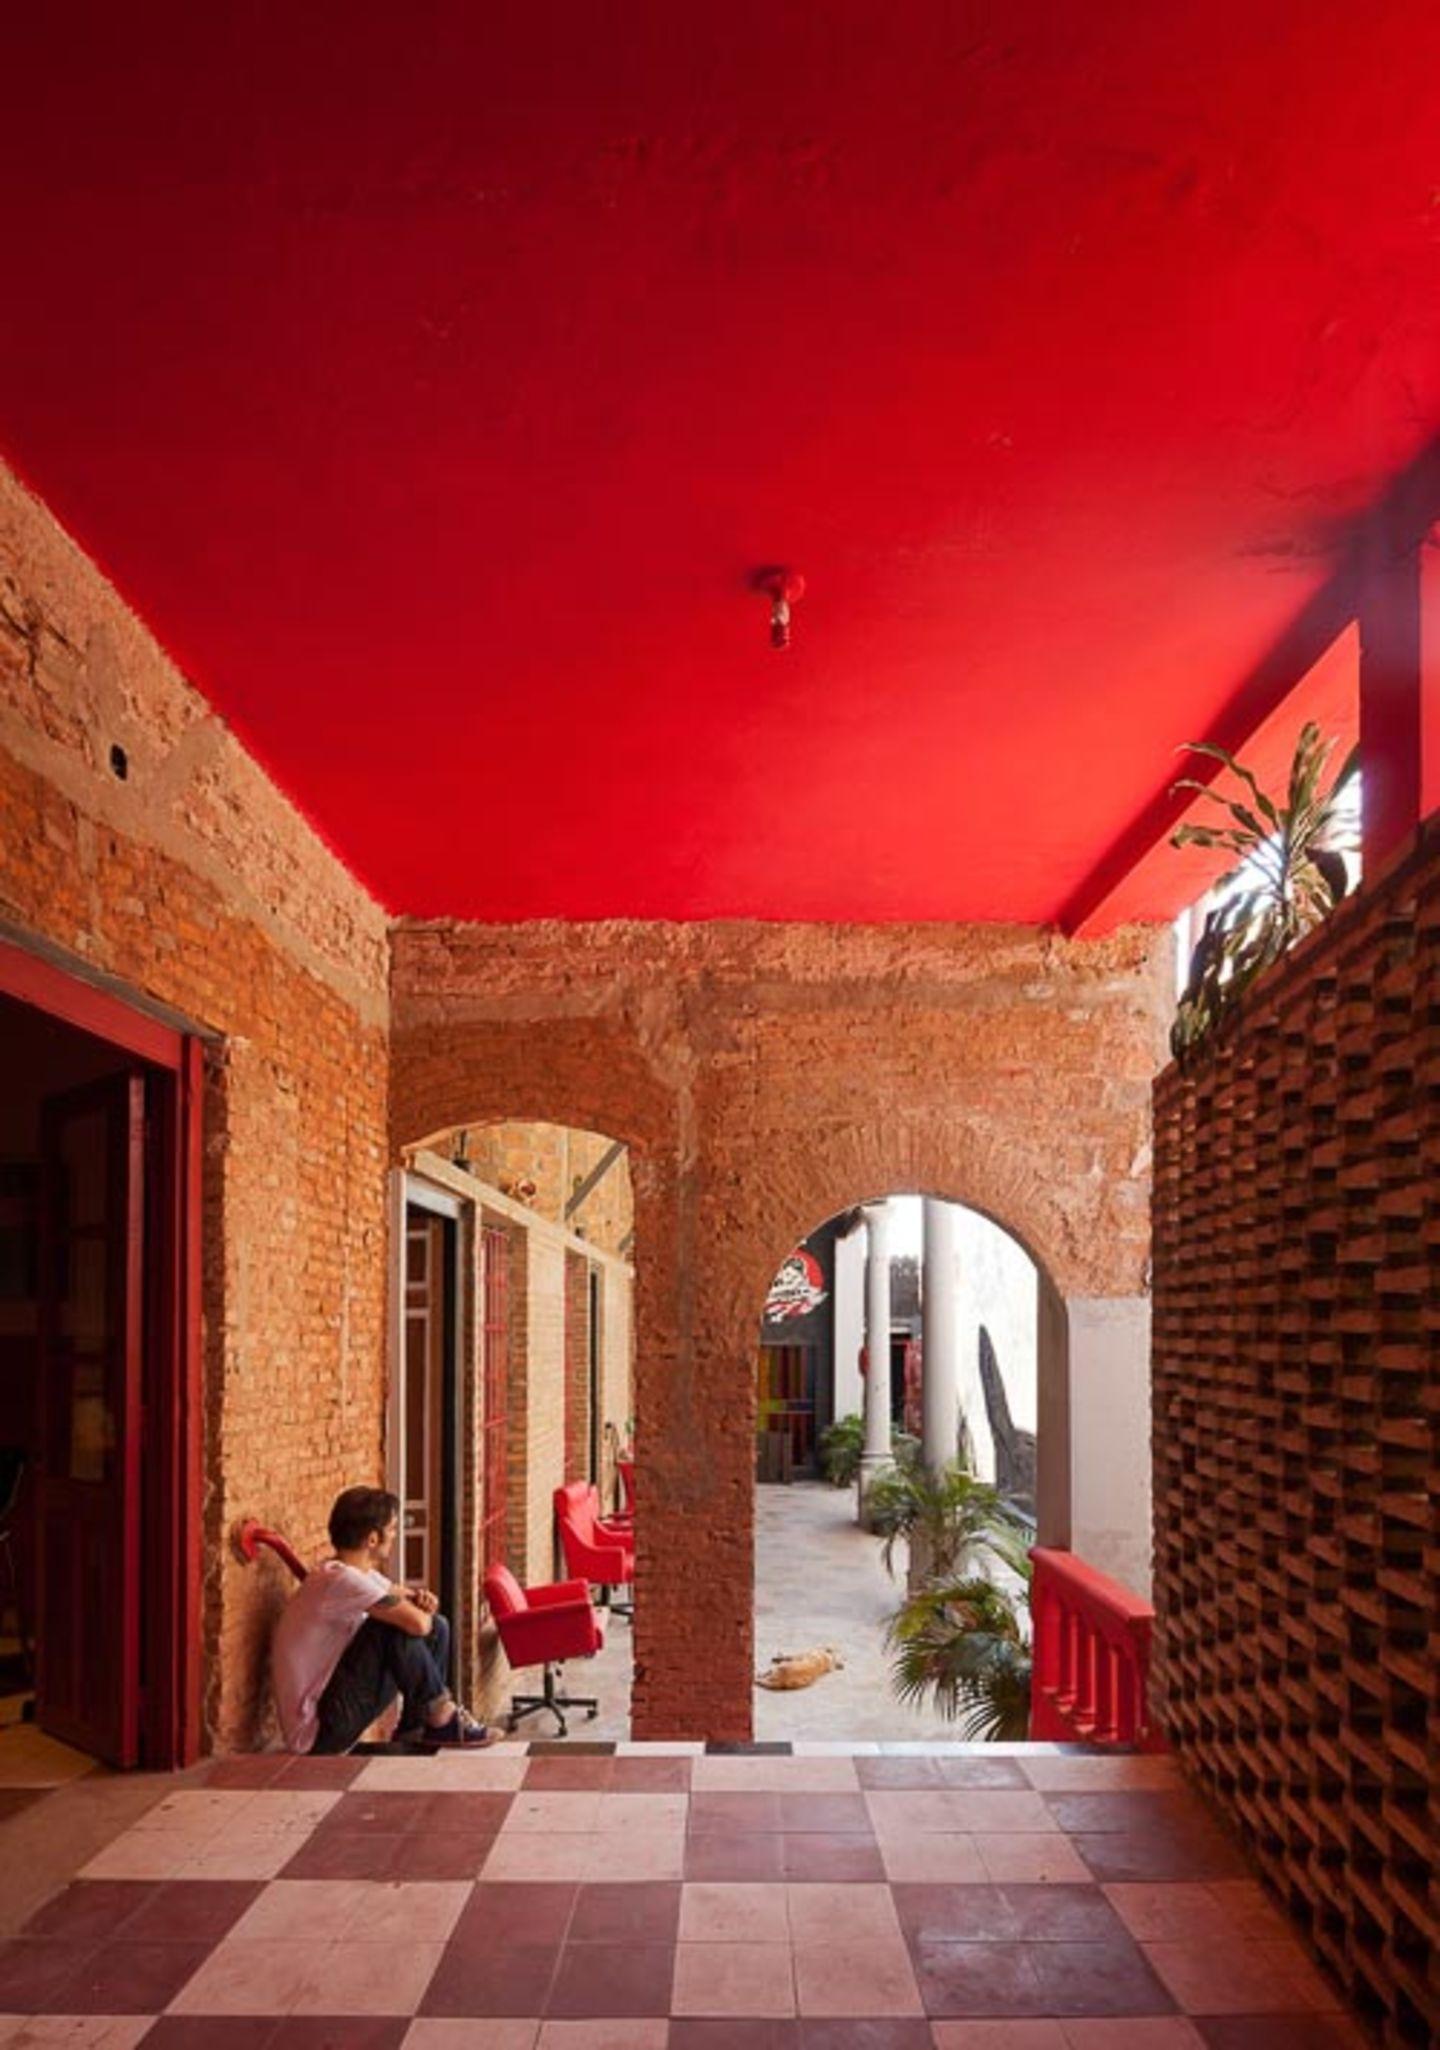 http://divisare.com/projects/275062-federico-cairoli-grupo-culata-jovai-ilona-house